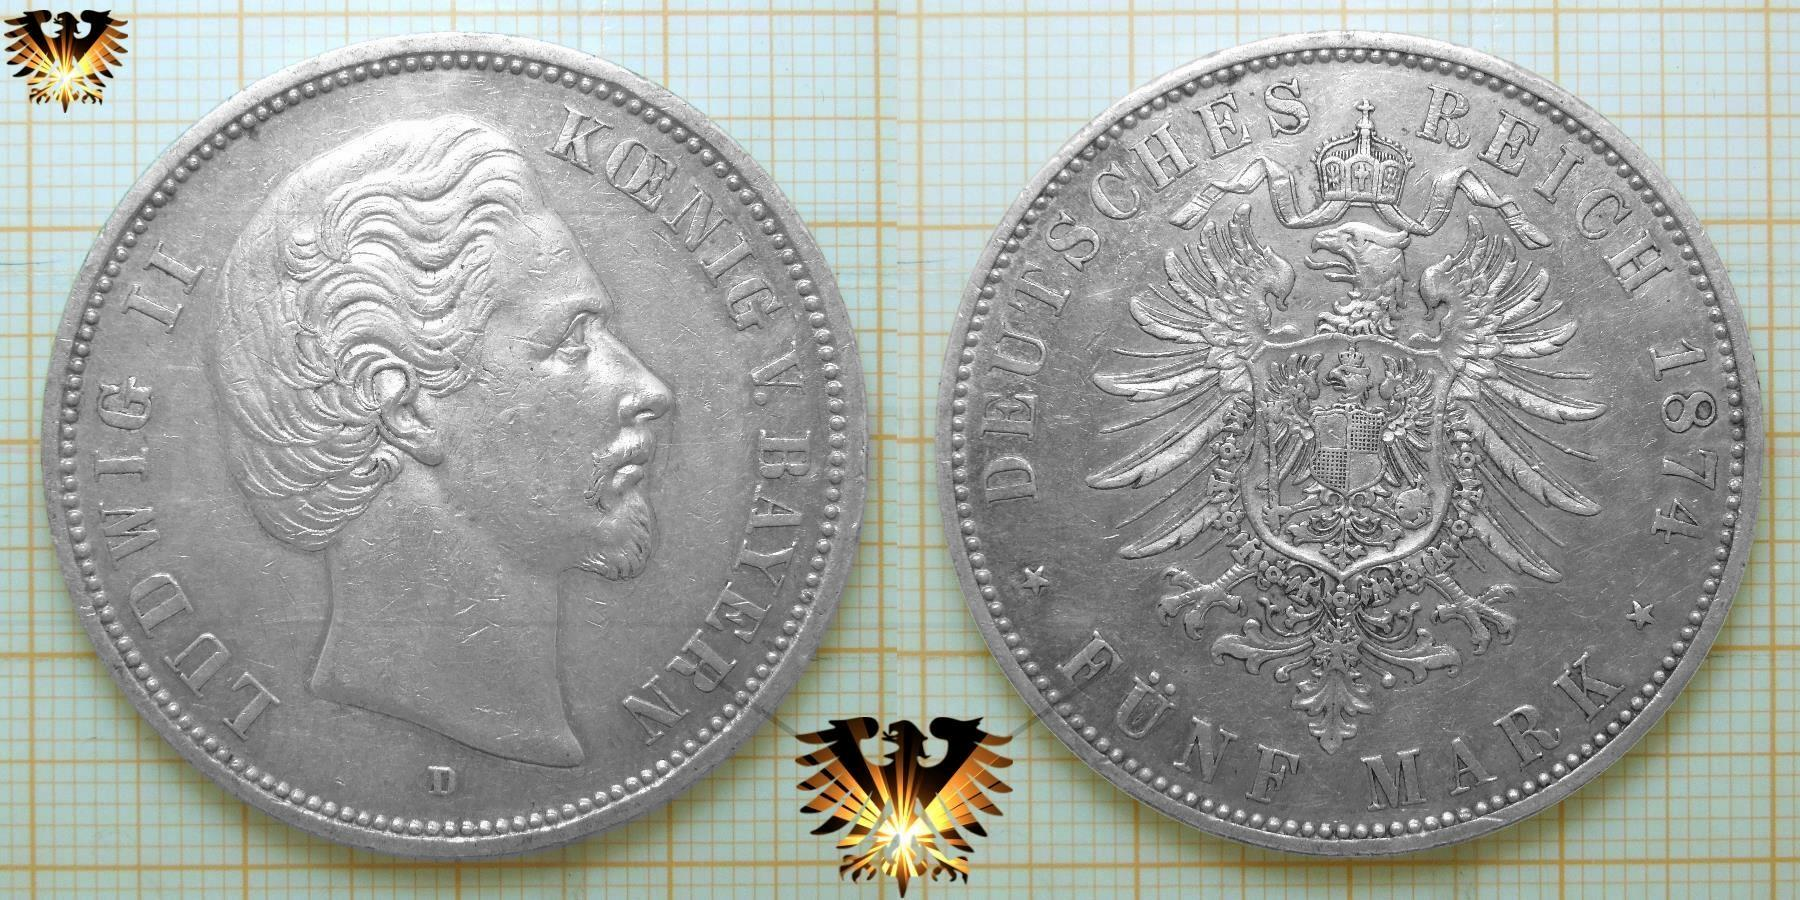 Bayern Silbermünze 2 Mark 1883 D König Ludwig Ii Aus Bayern